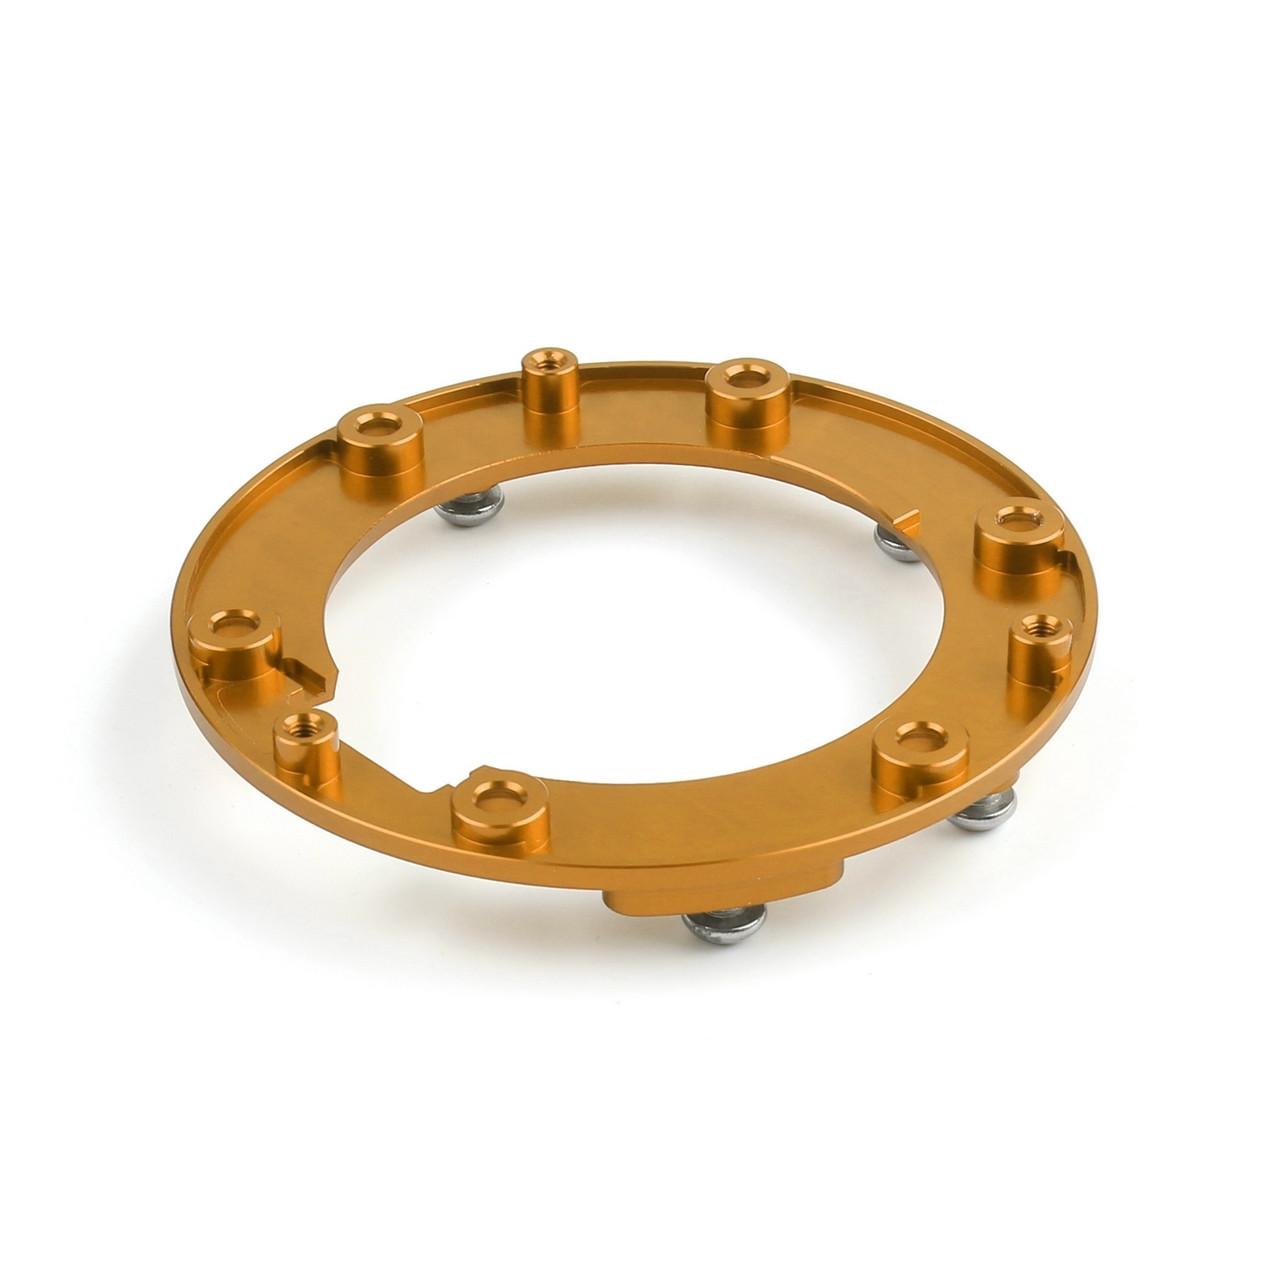 CNC Oil Seal Cap Mounting Brackets BMW R1200GS (2013-2014) Gold